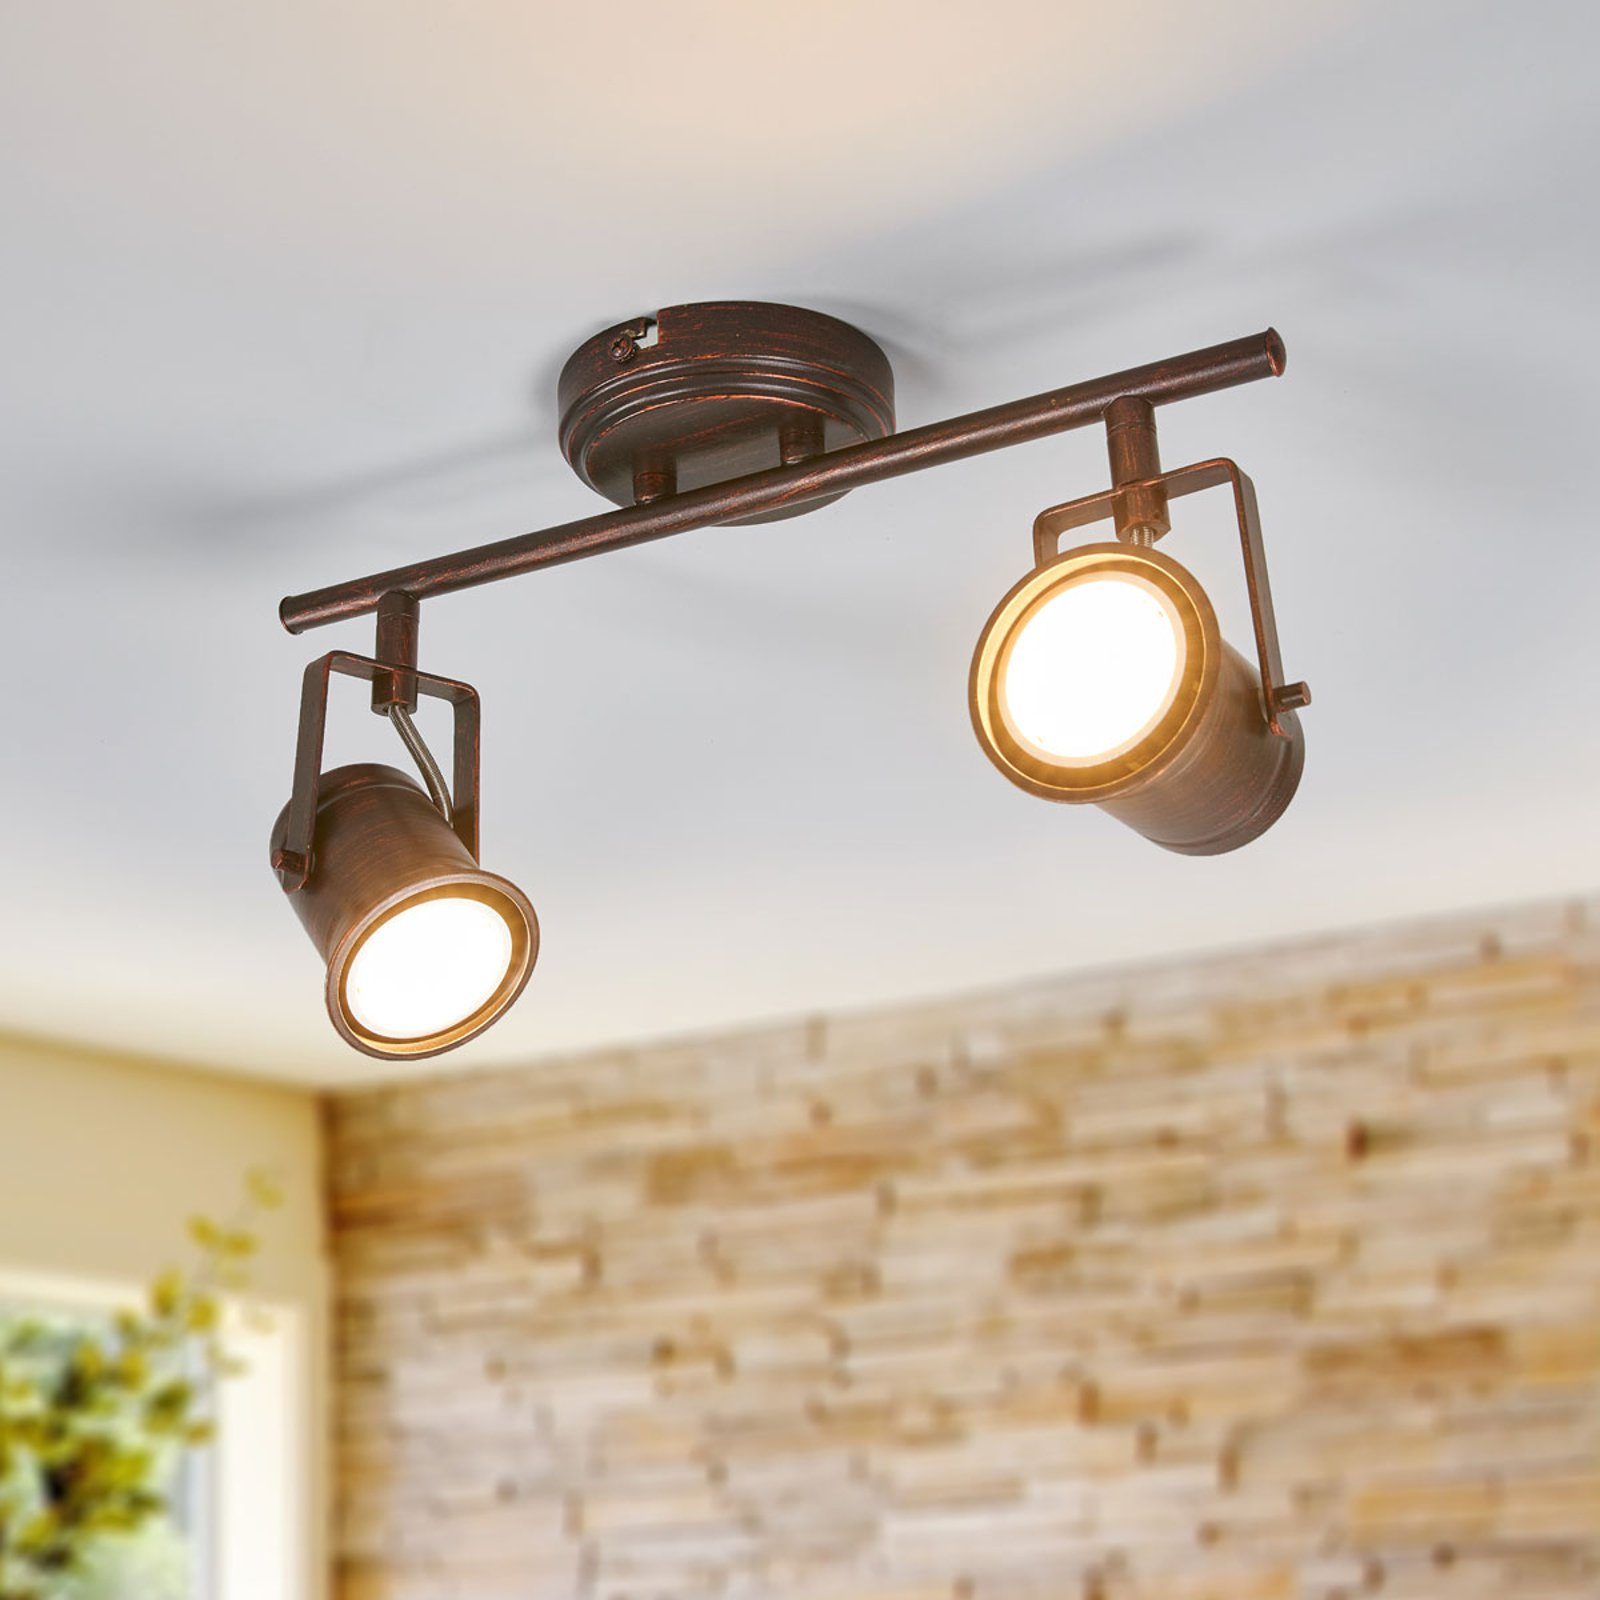 Cansu - LED-taklampe med 2 lys, brun-gull